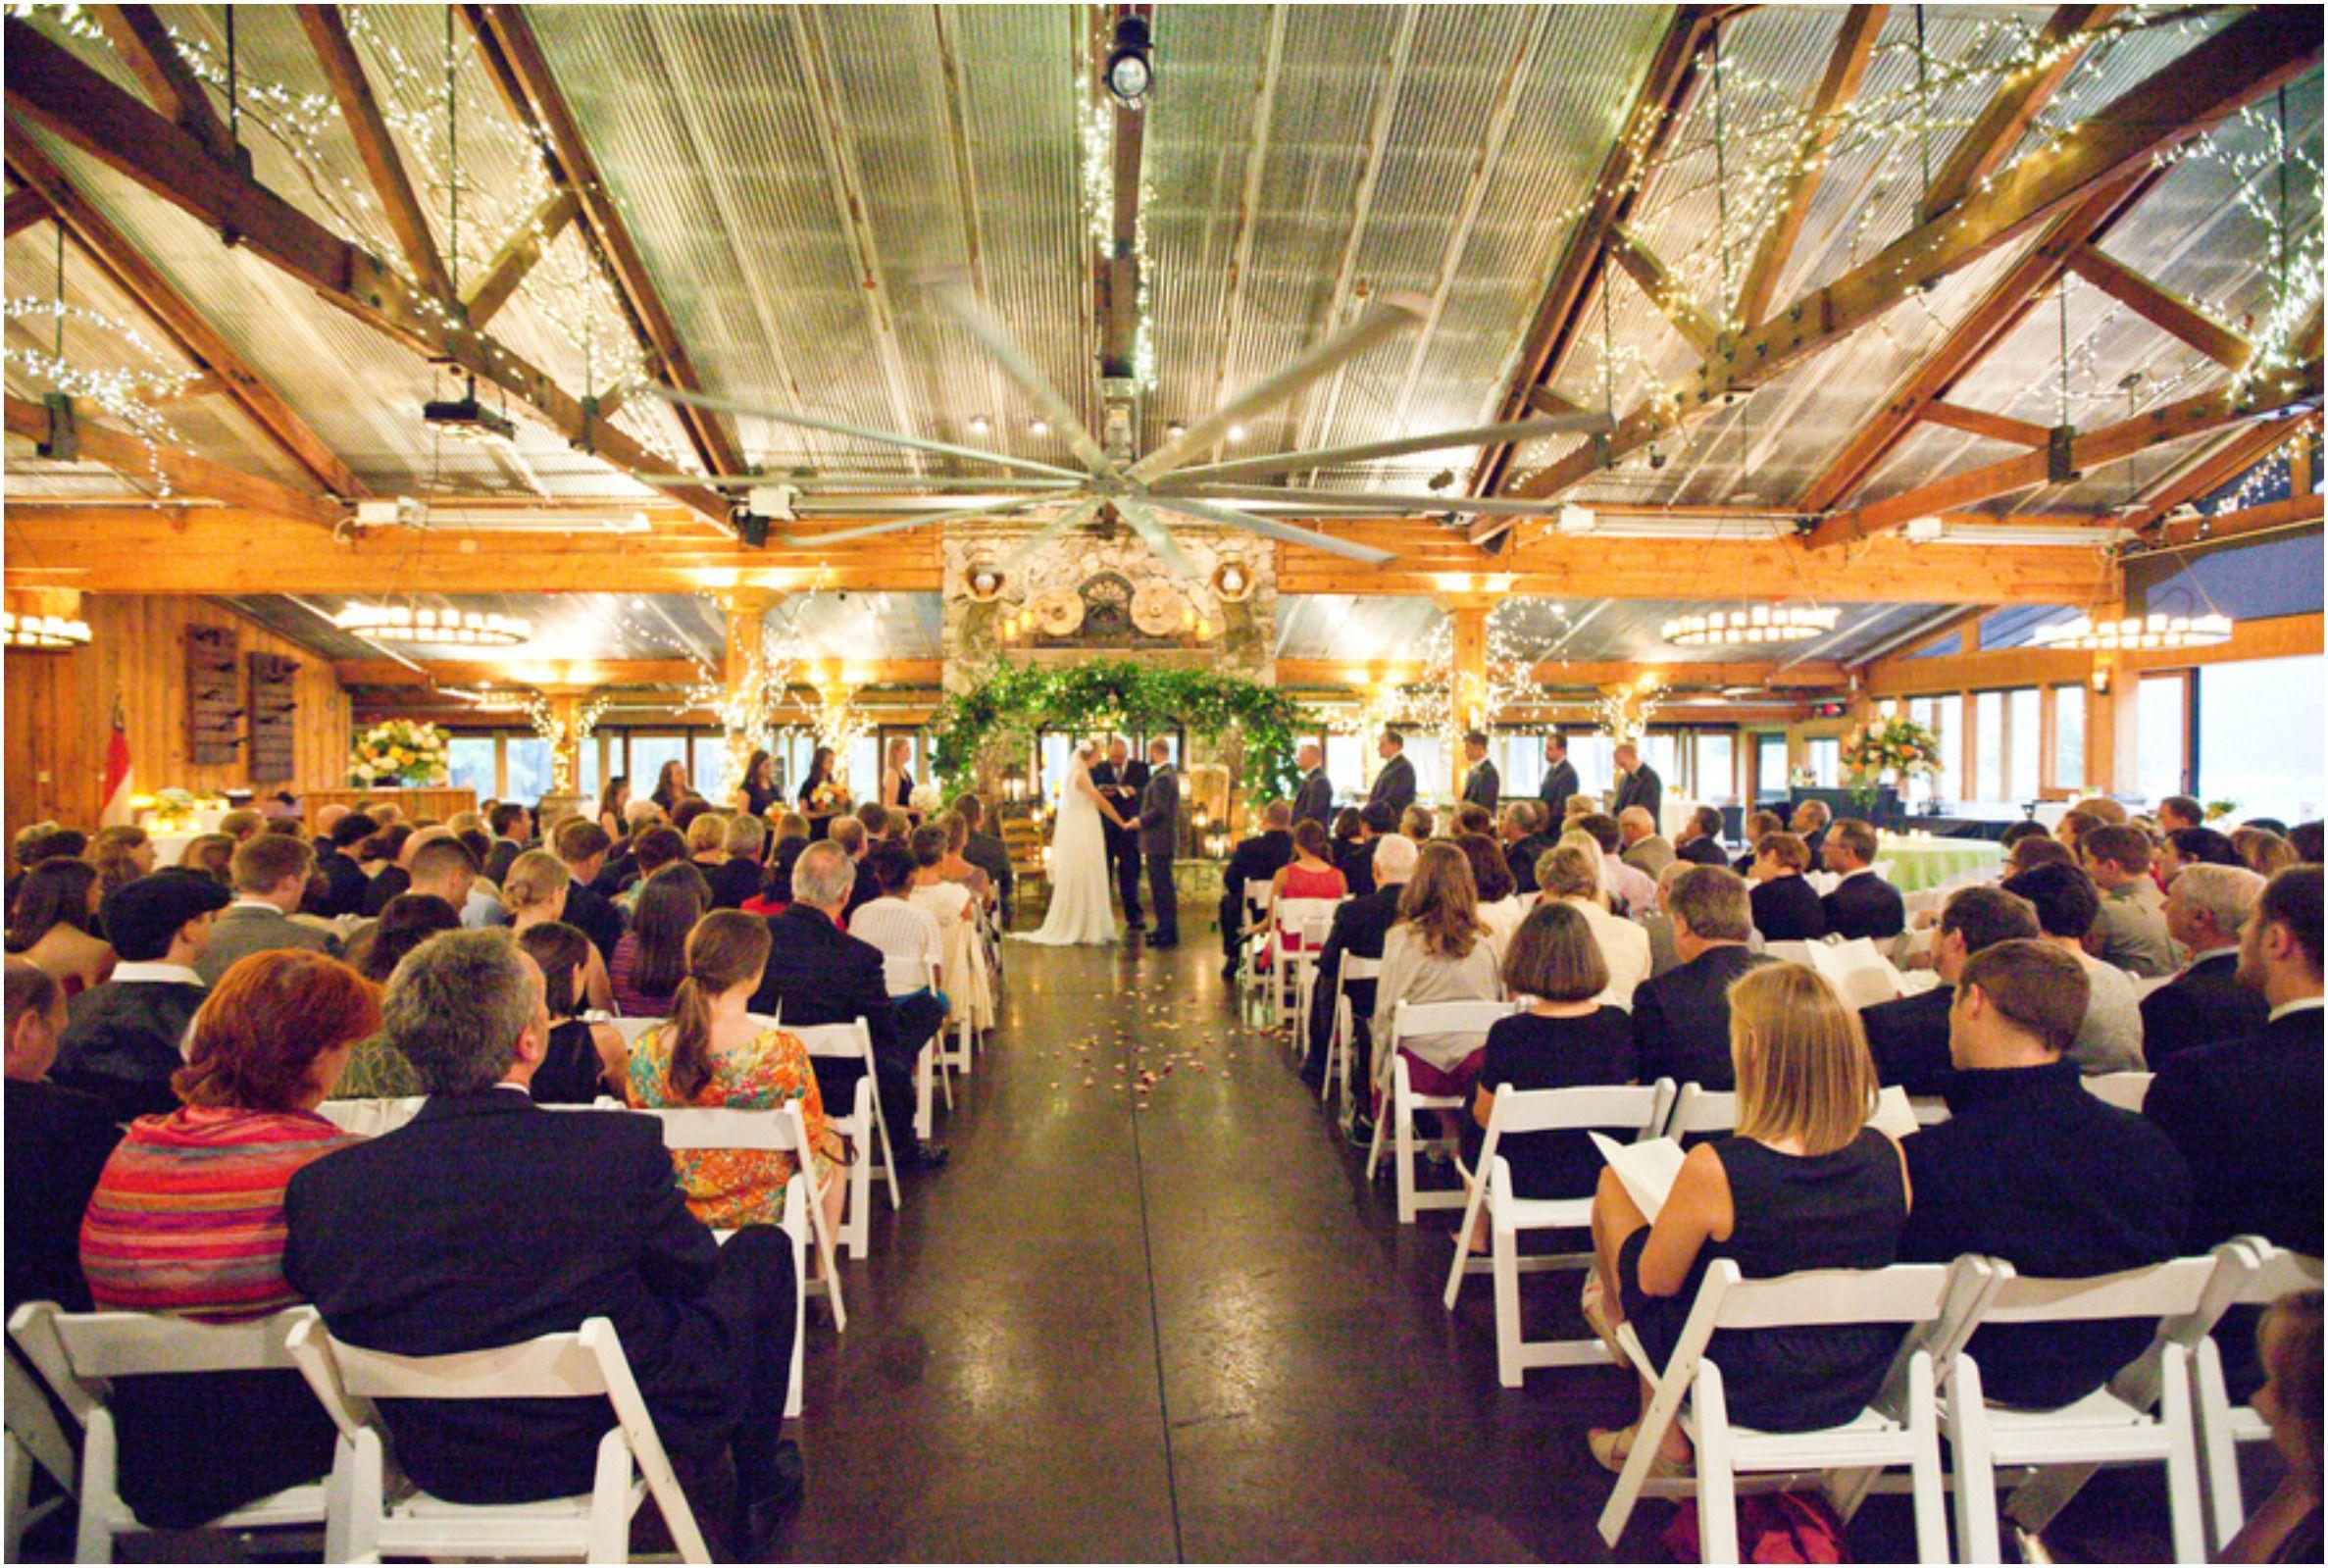 An Indoor Rustic Ceremony: Rainy Day Ranch Wedding